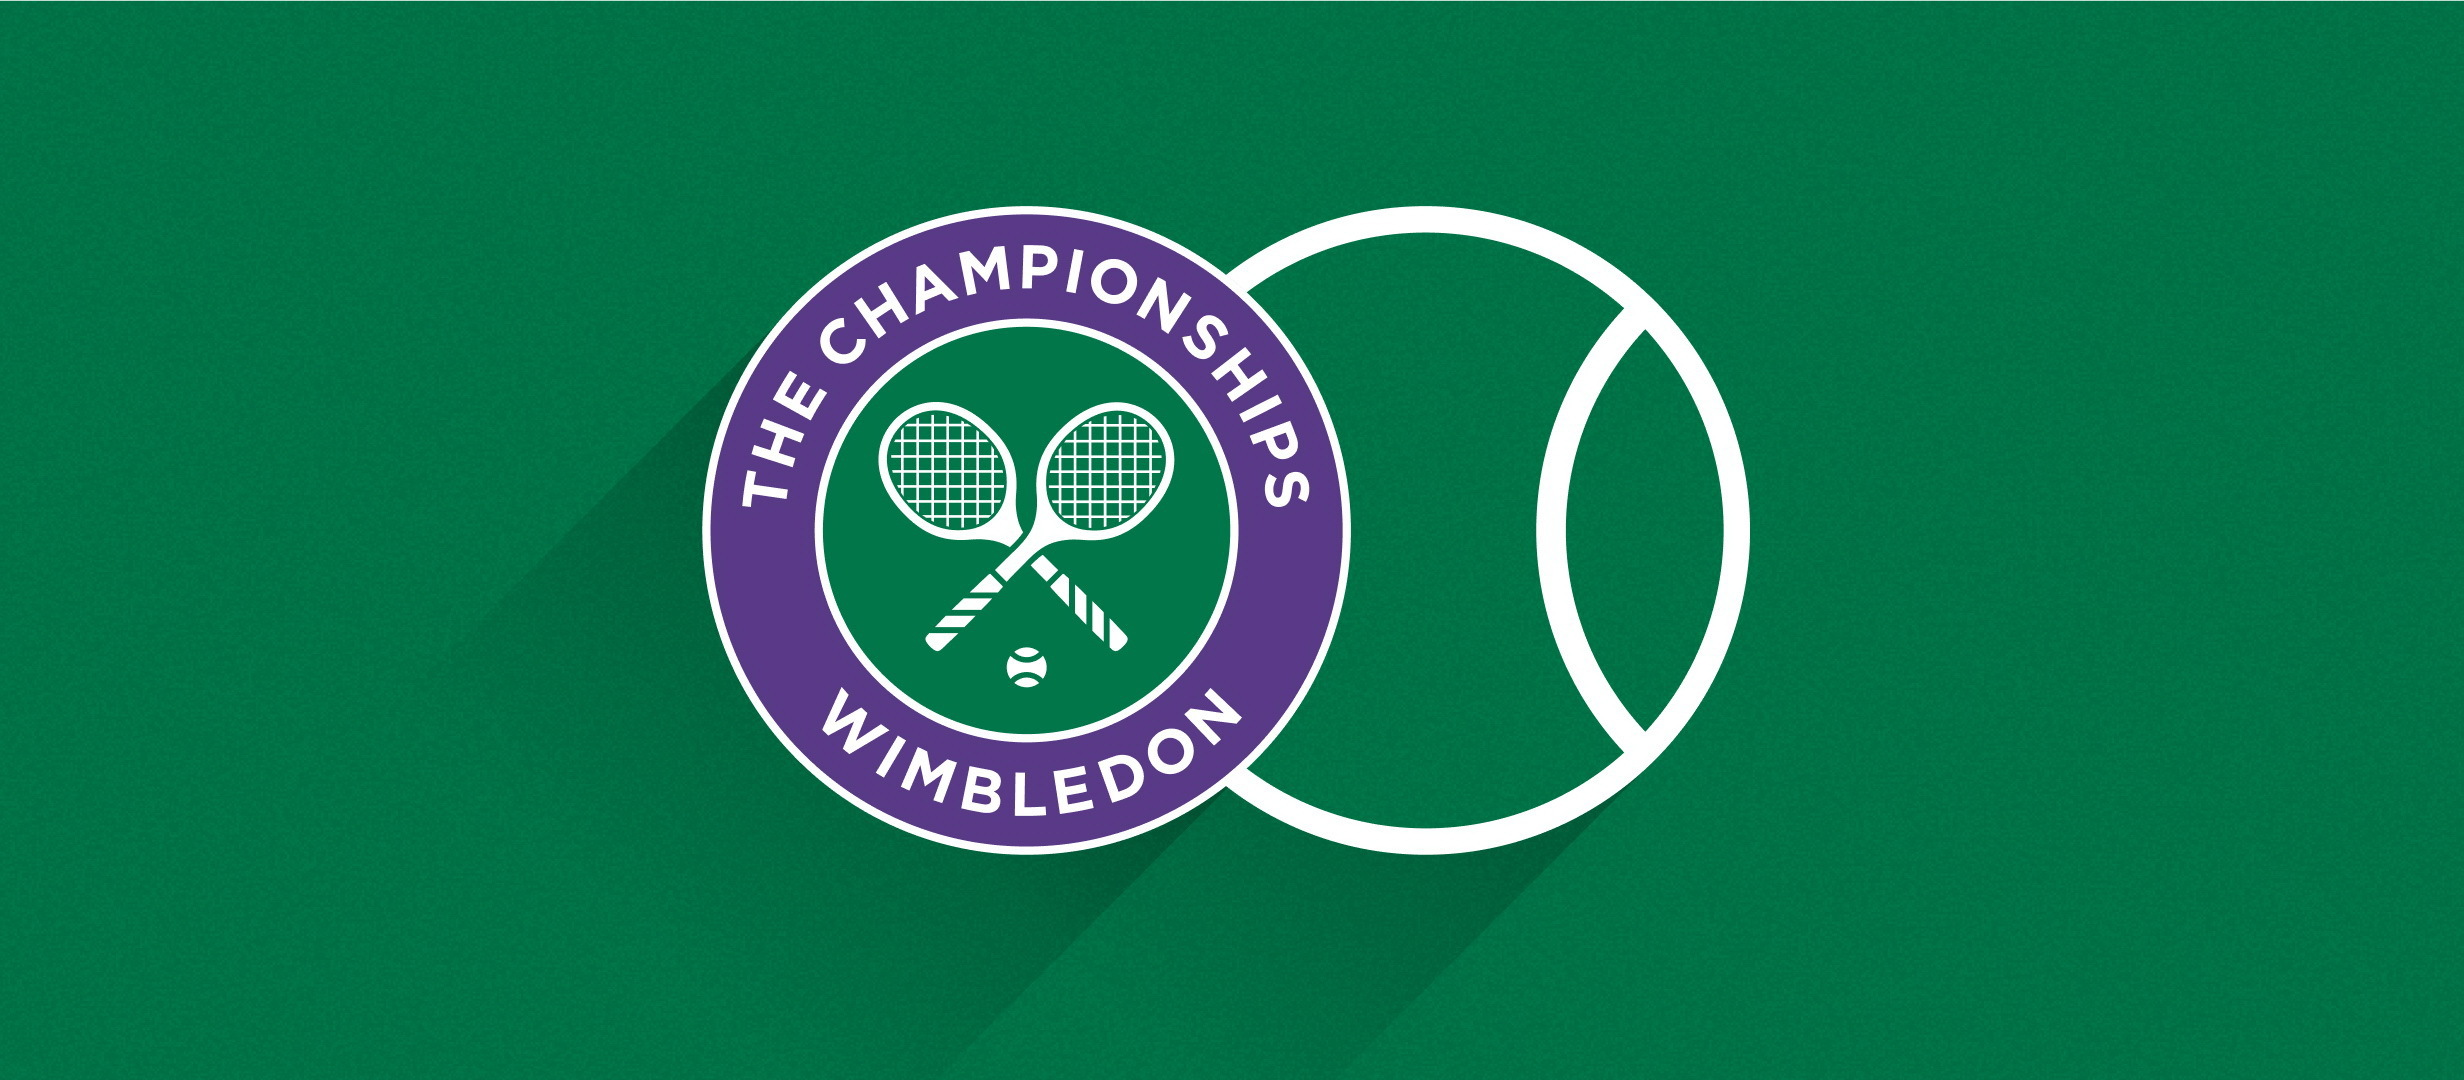 Wimbledon 2021 - Castiga Djokovic al 20-lea Grand Slam?